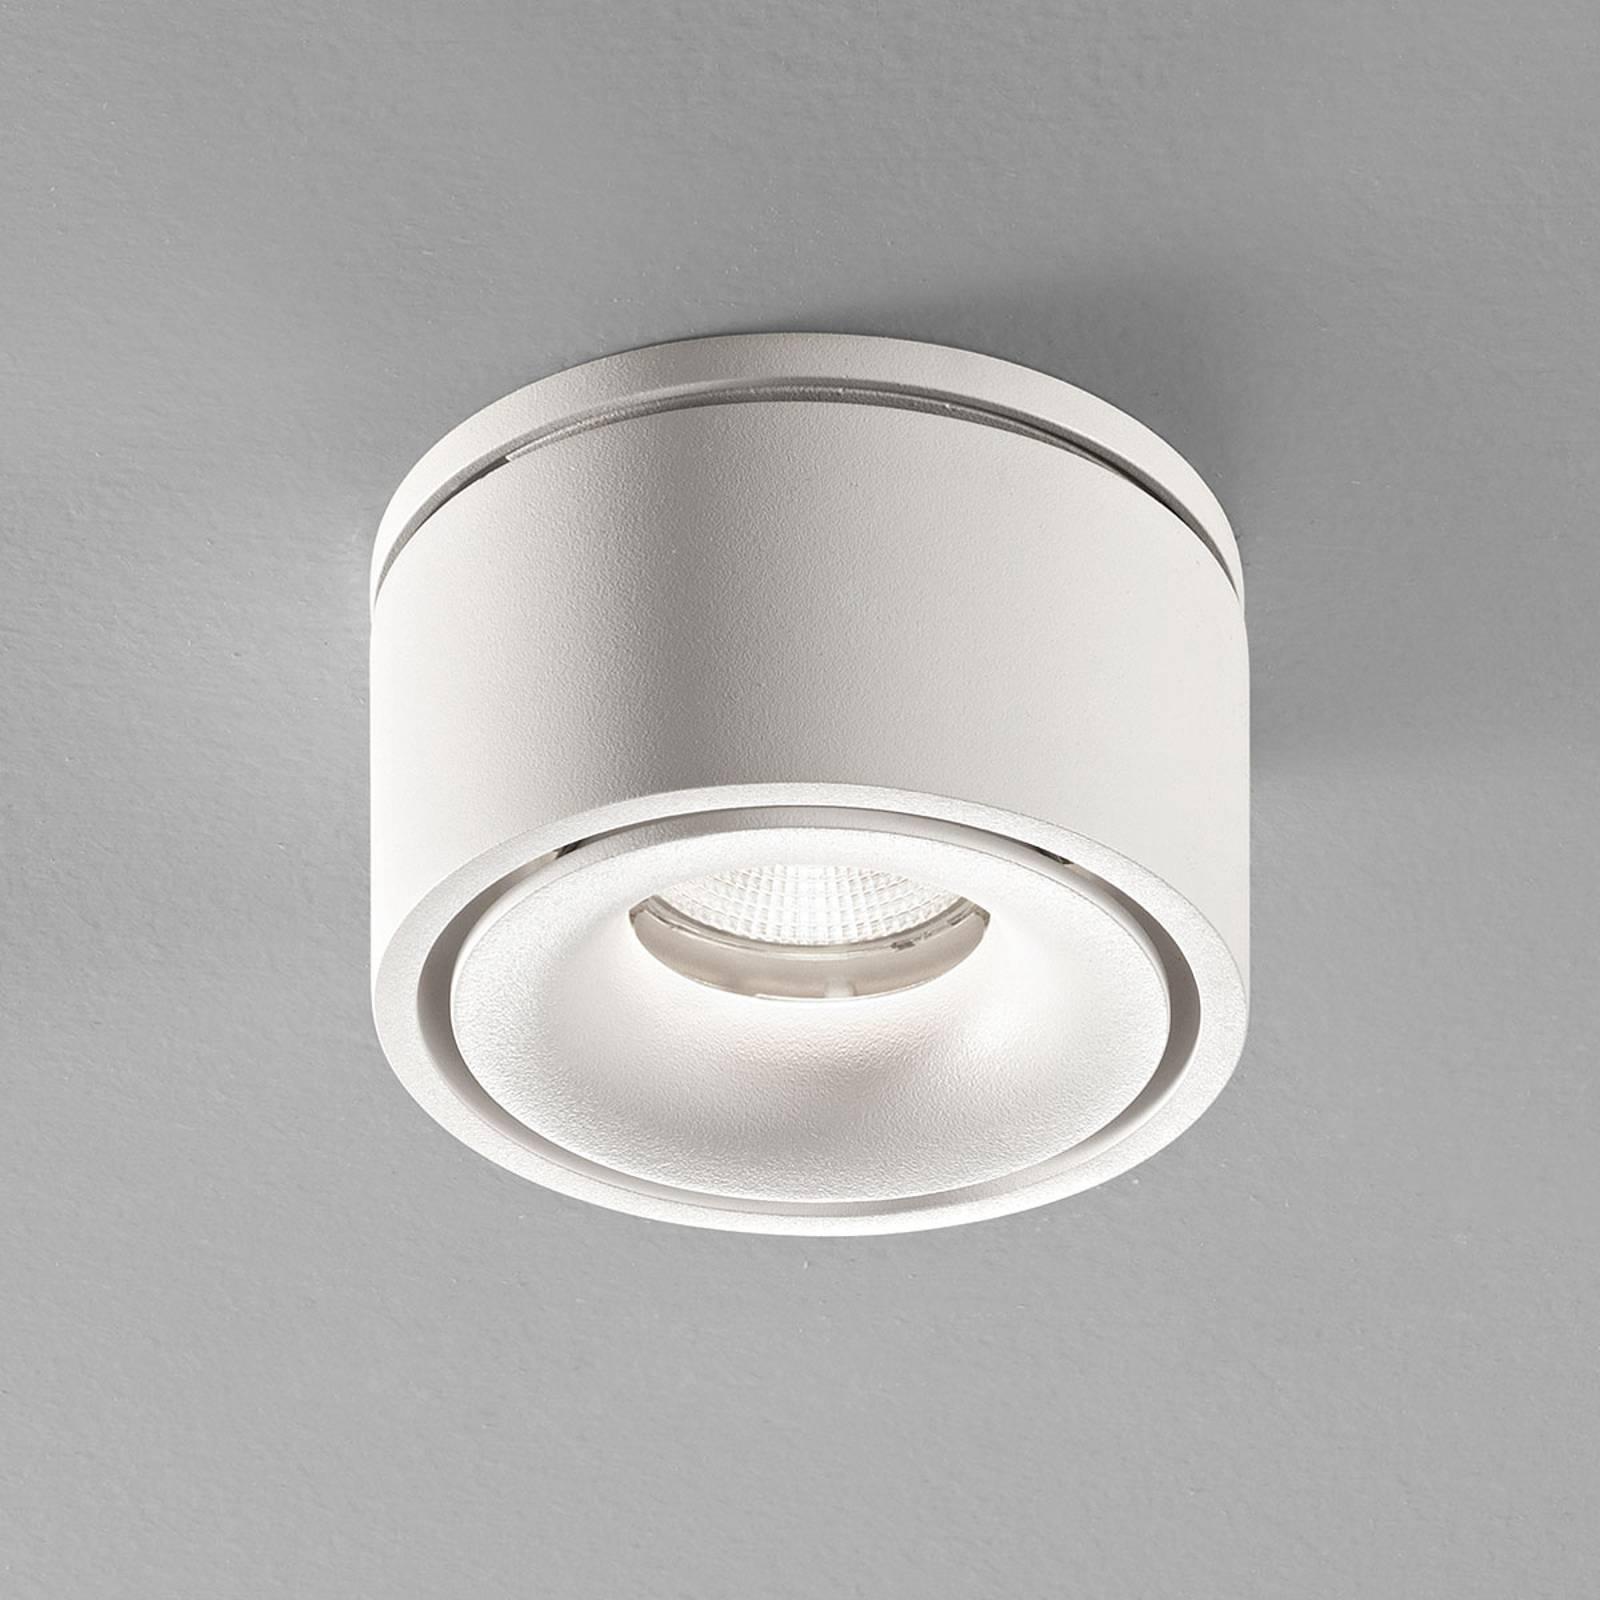 Egger Clippo EP LED inbouwspot, wit, 3.000K